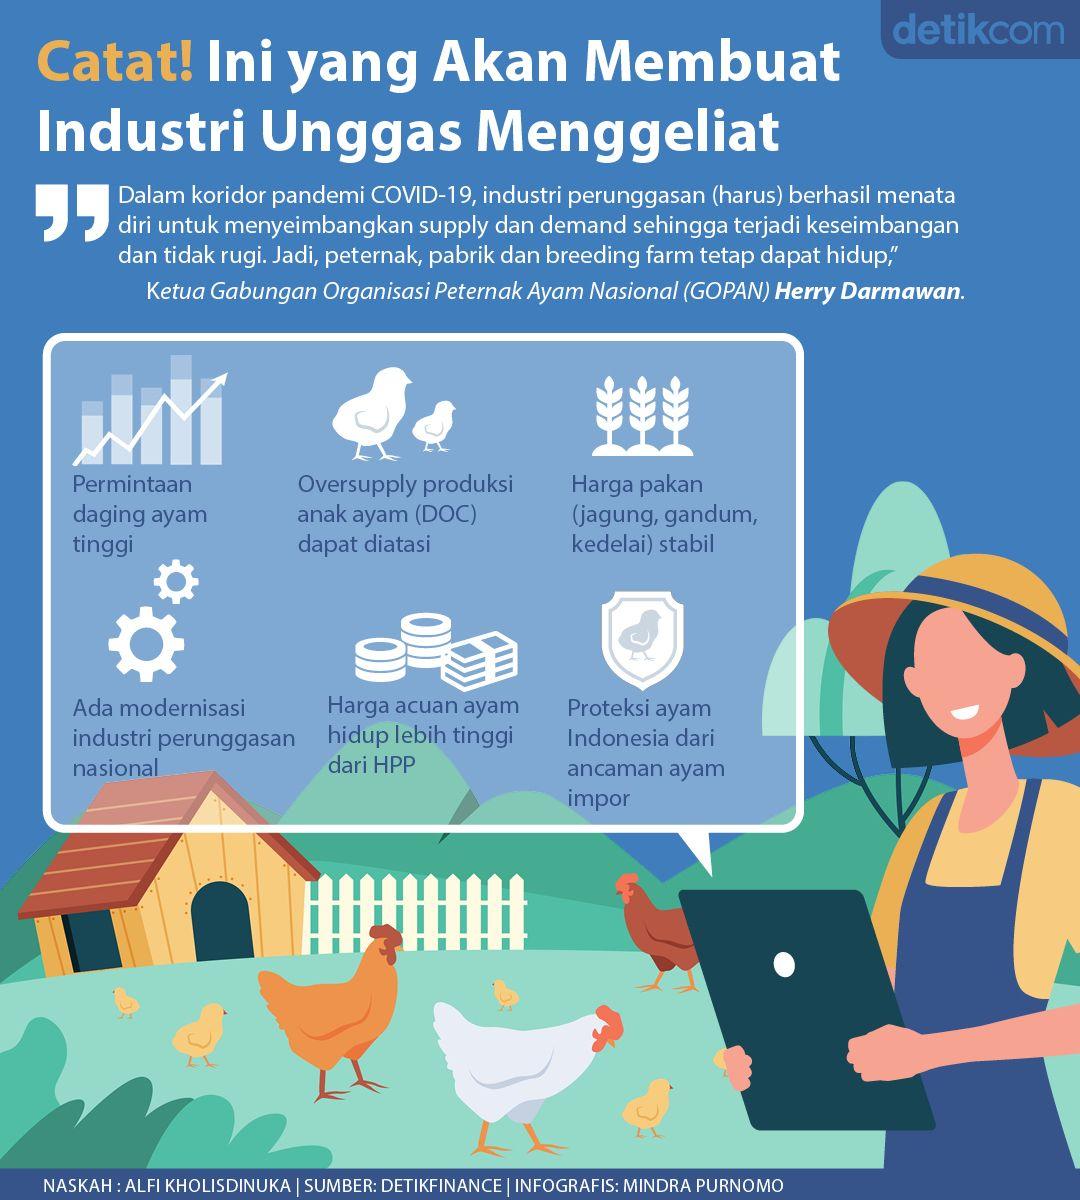 Industri Unggas